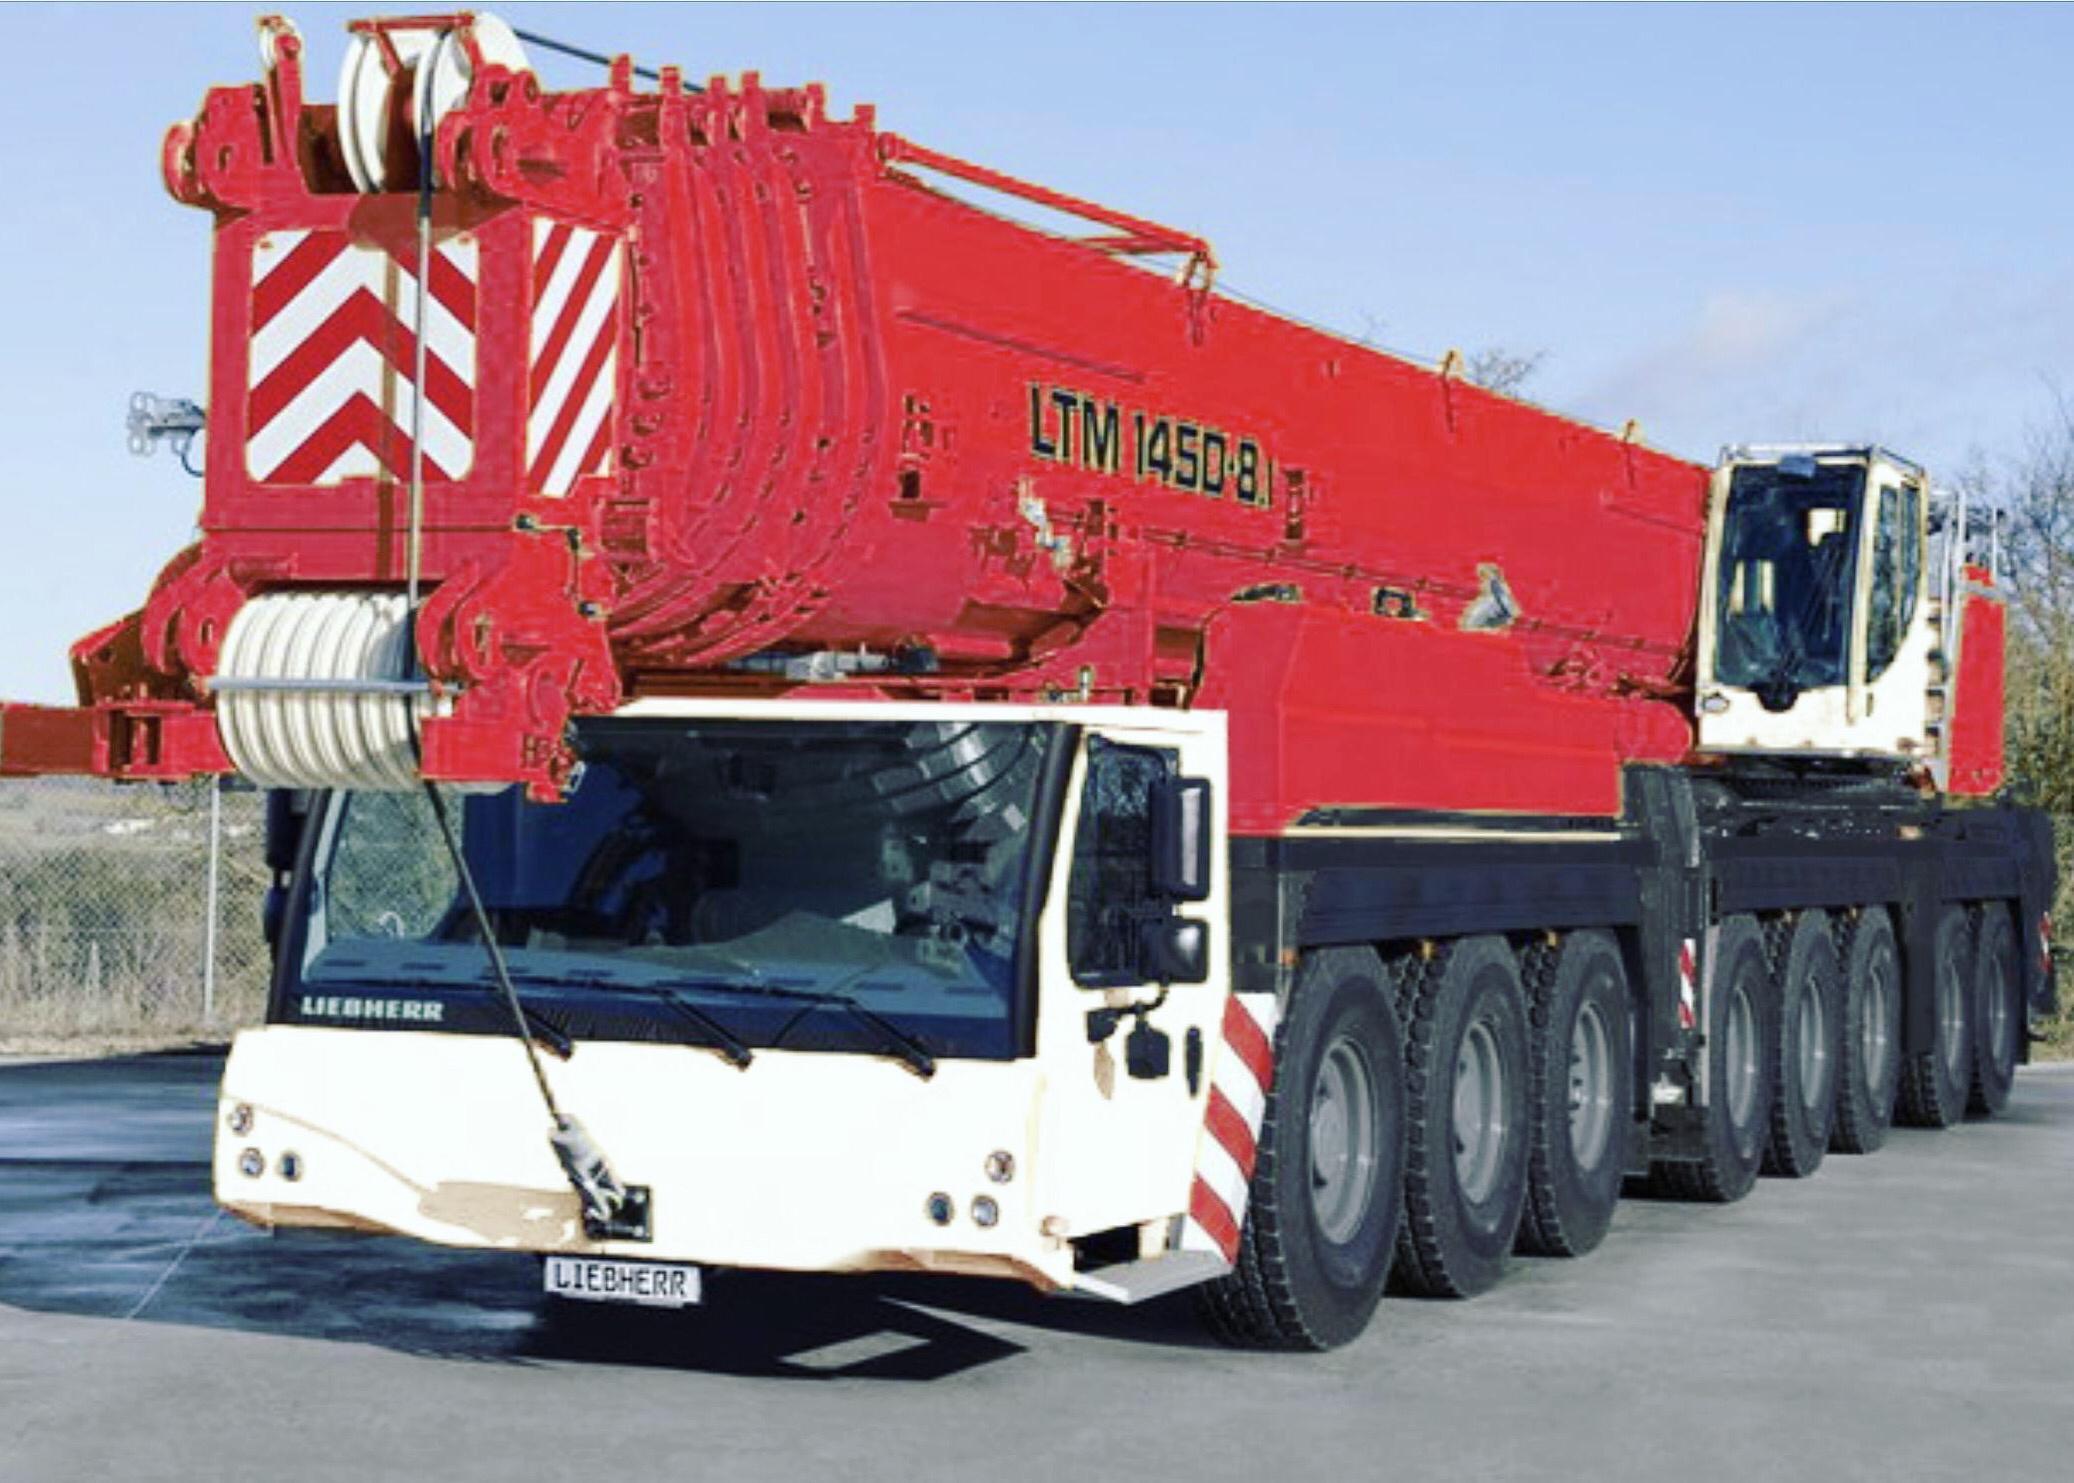 City Lifting Welcomes the Liebherr LTM 1450 - Heavy Cranes